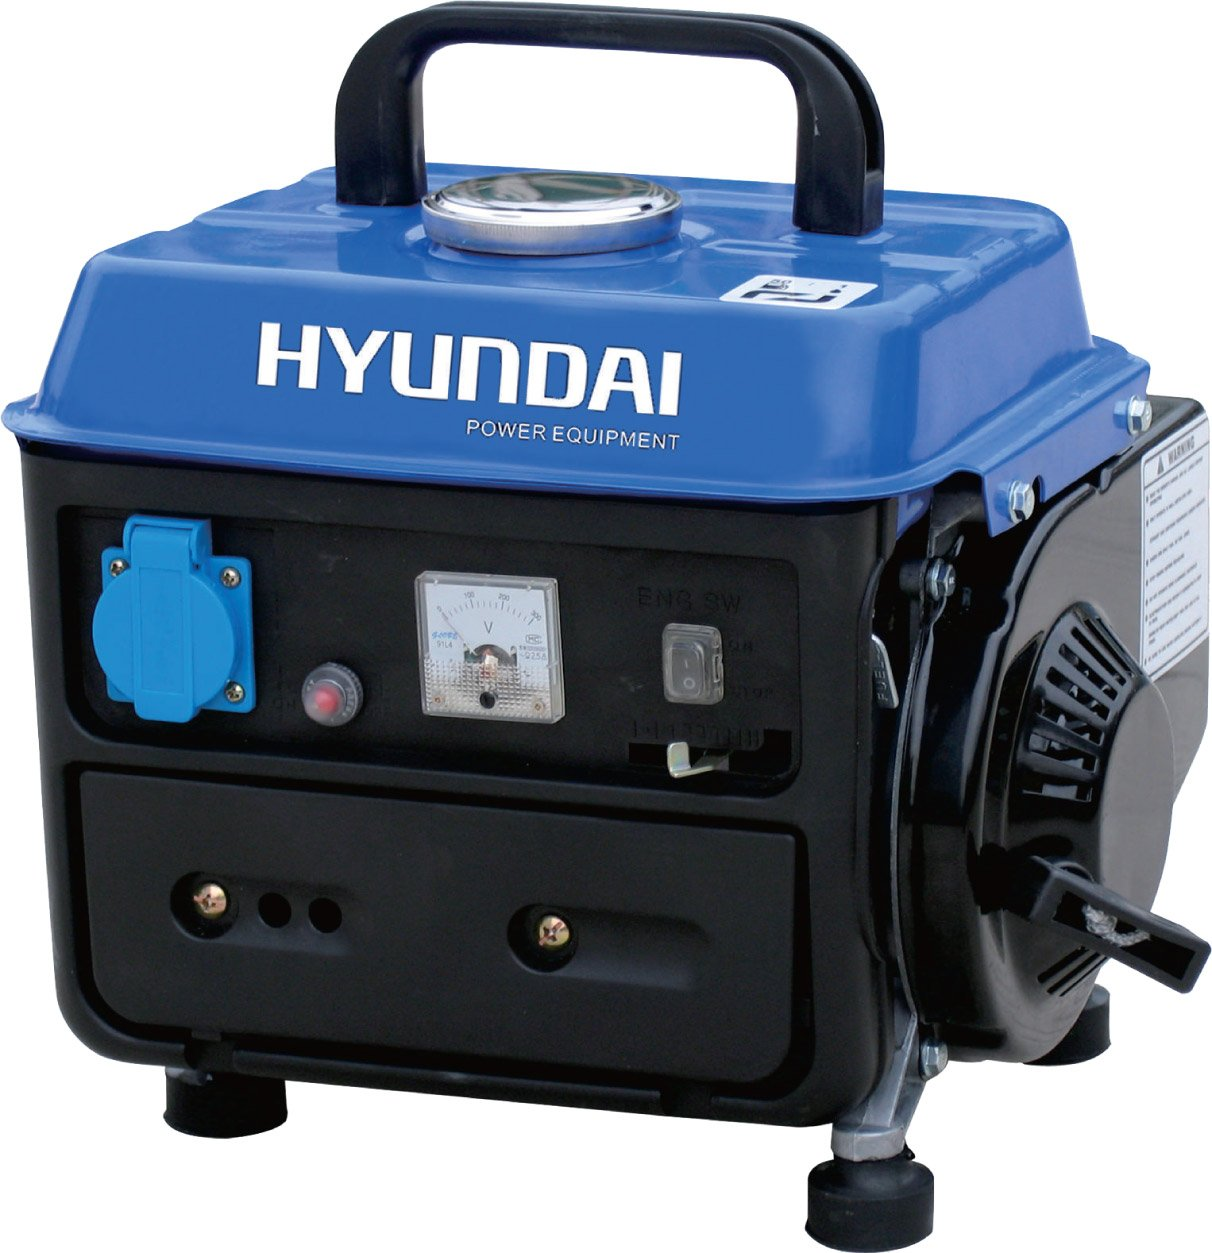 Hyundai HG 800-3 Stromerzeuger 650/720 W